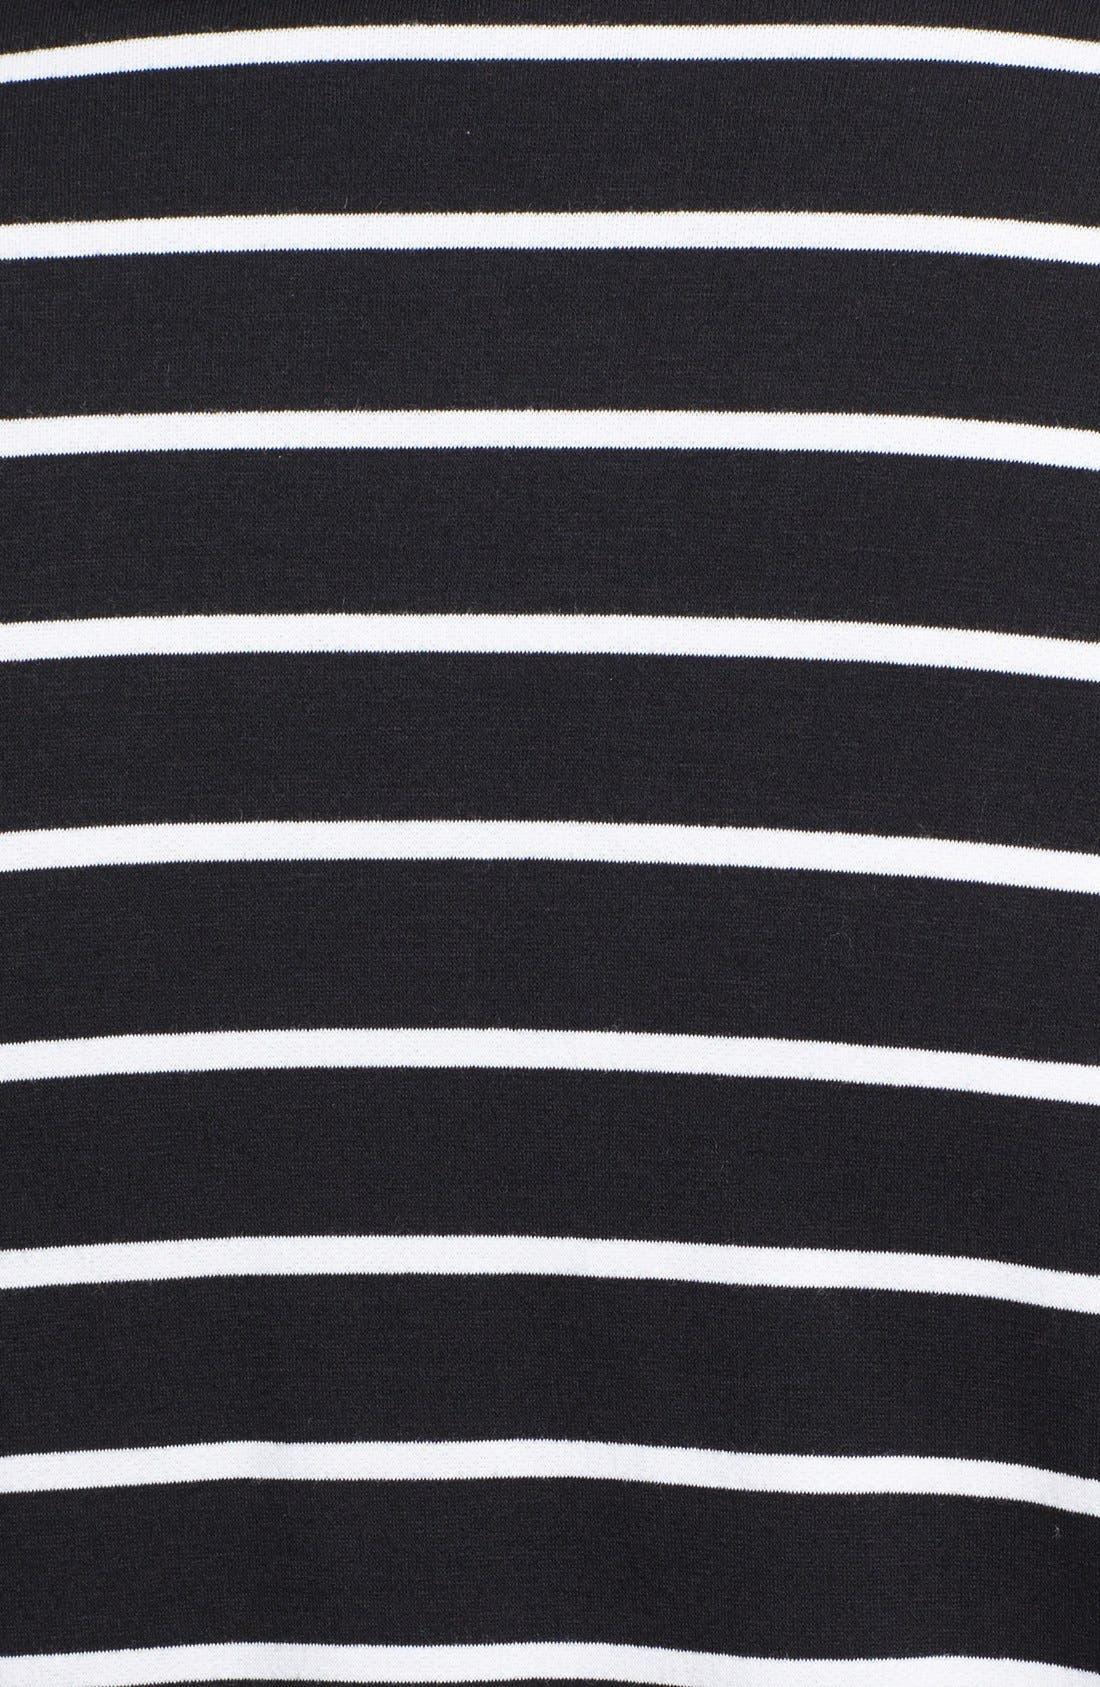 Stripe Fleece Wrap,                             Alternate thumbnail 3, color,                             Ivory Stripe